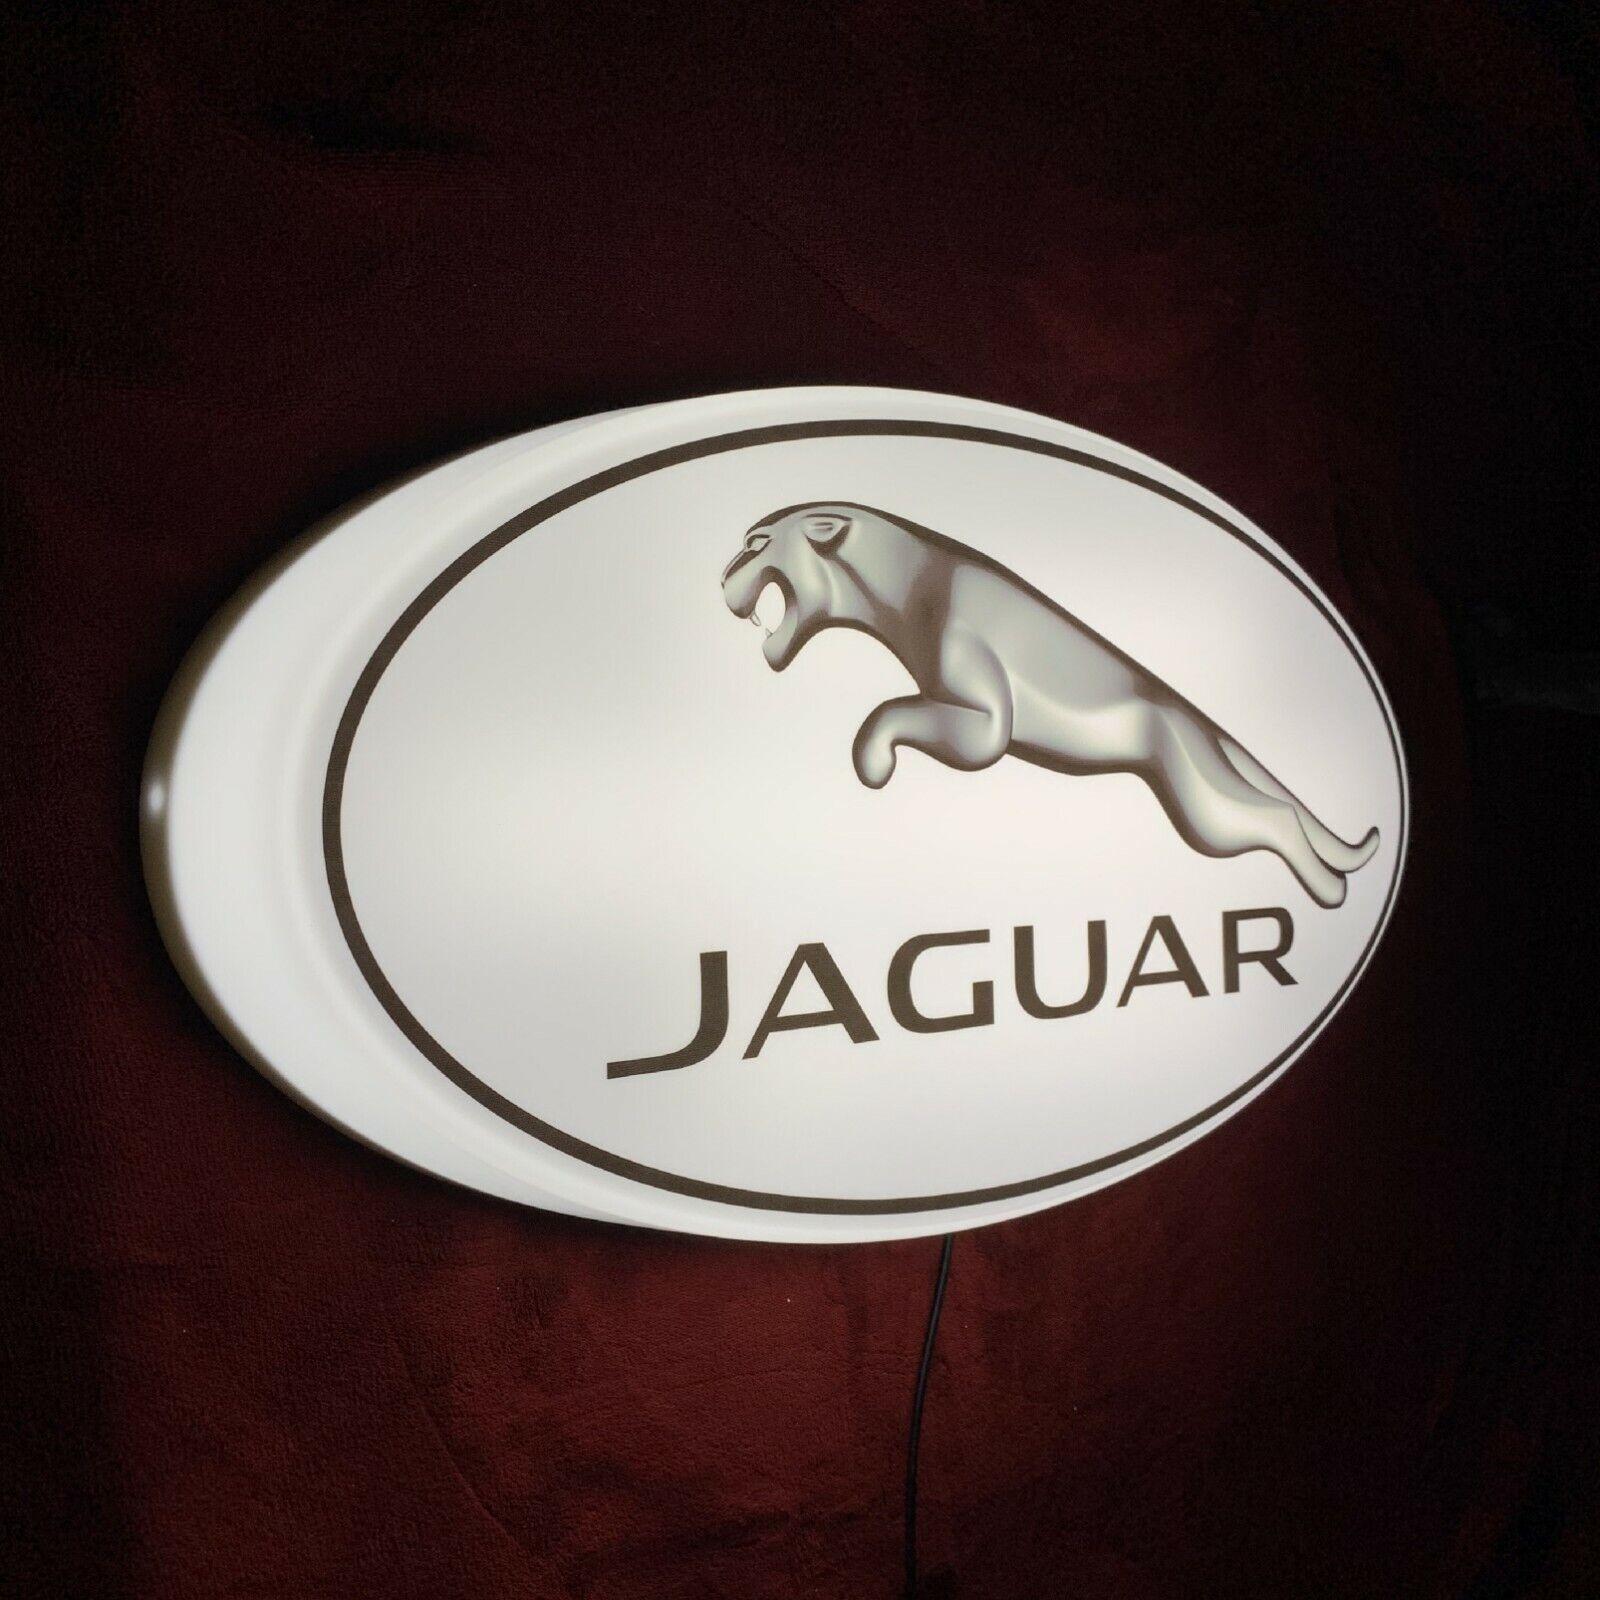 JAGUAR LED ILLUMINATED LIGHT UP GARAGE SIGN PETROL GASOLINE automobilia F TYPE